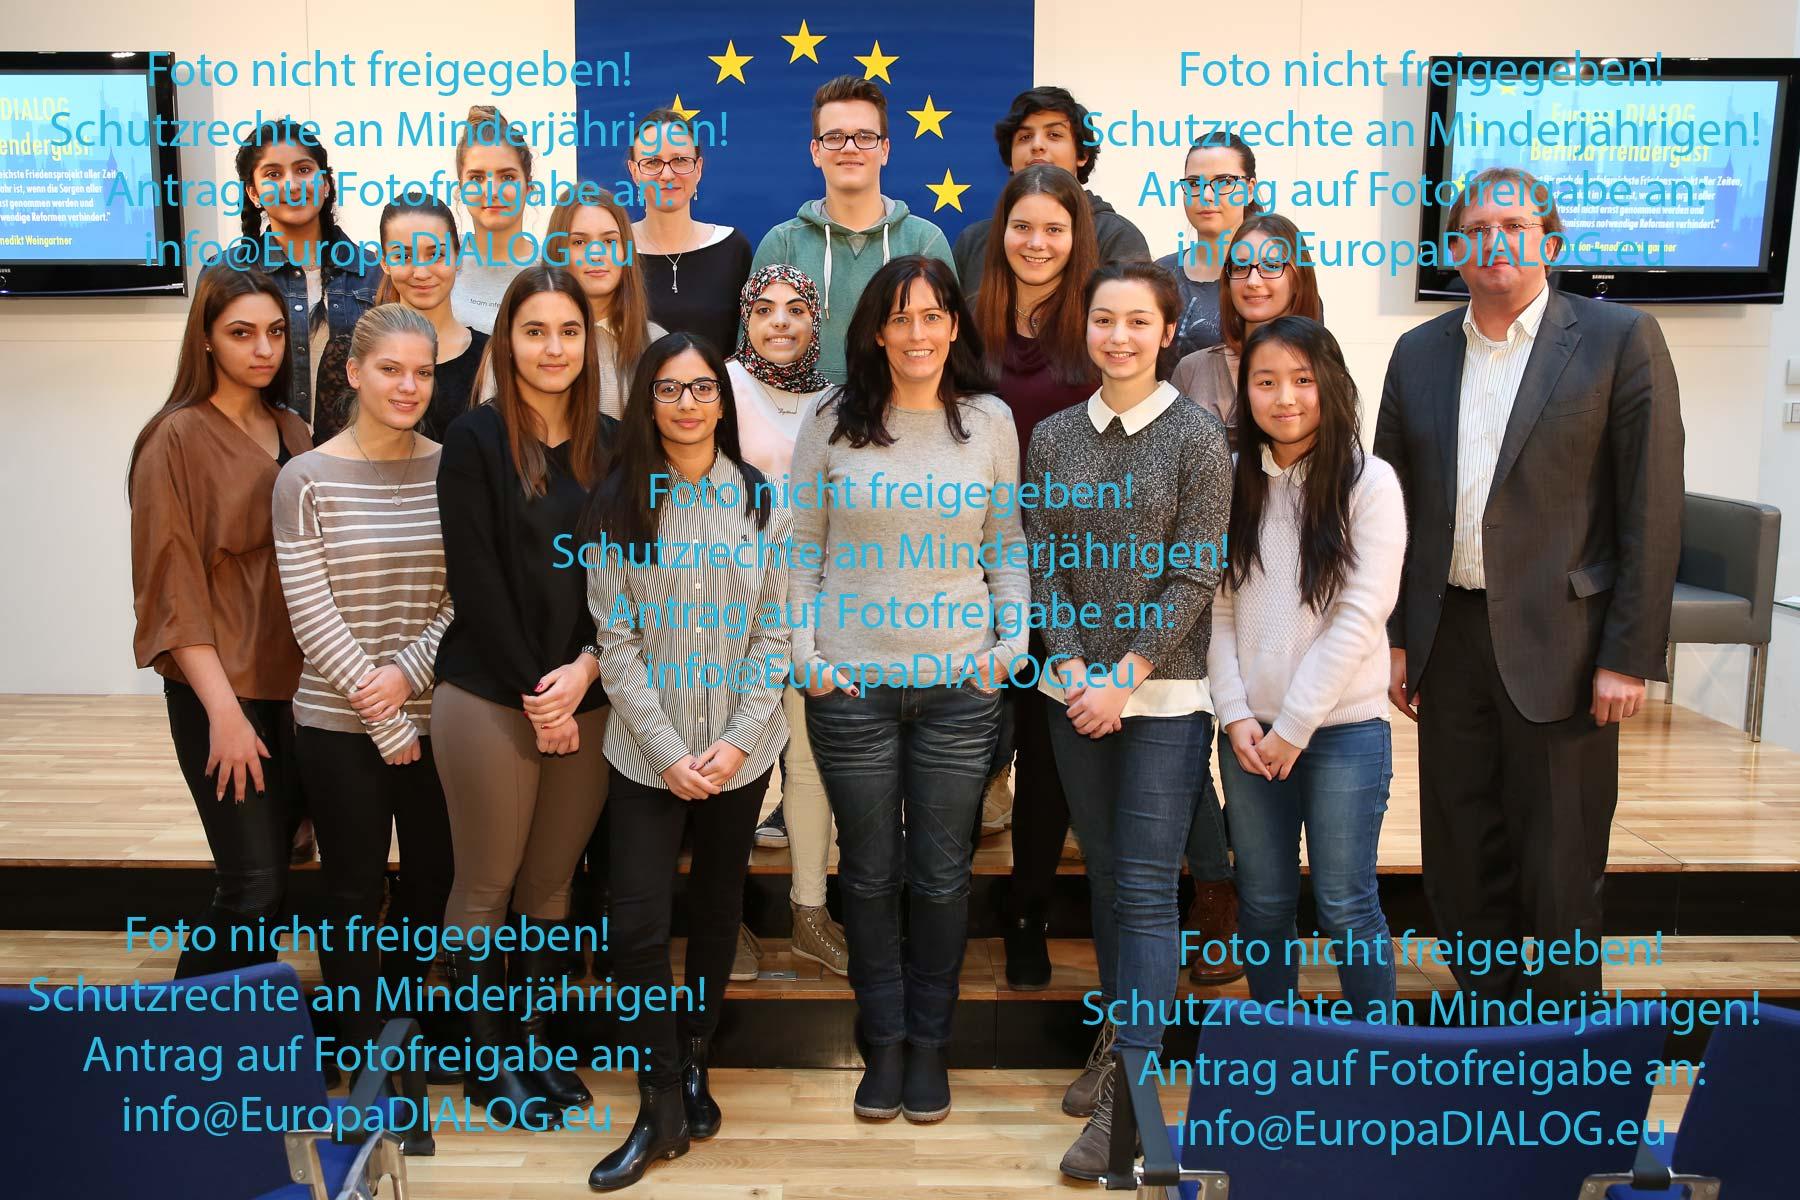 europadialog_bettina-prendergast_s_e06_grg-10-laaerbergstr_061877_-katharina-schiffl__